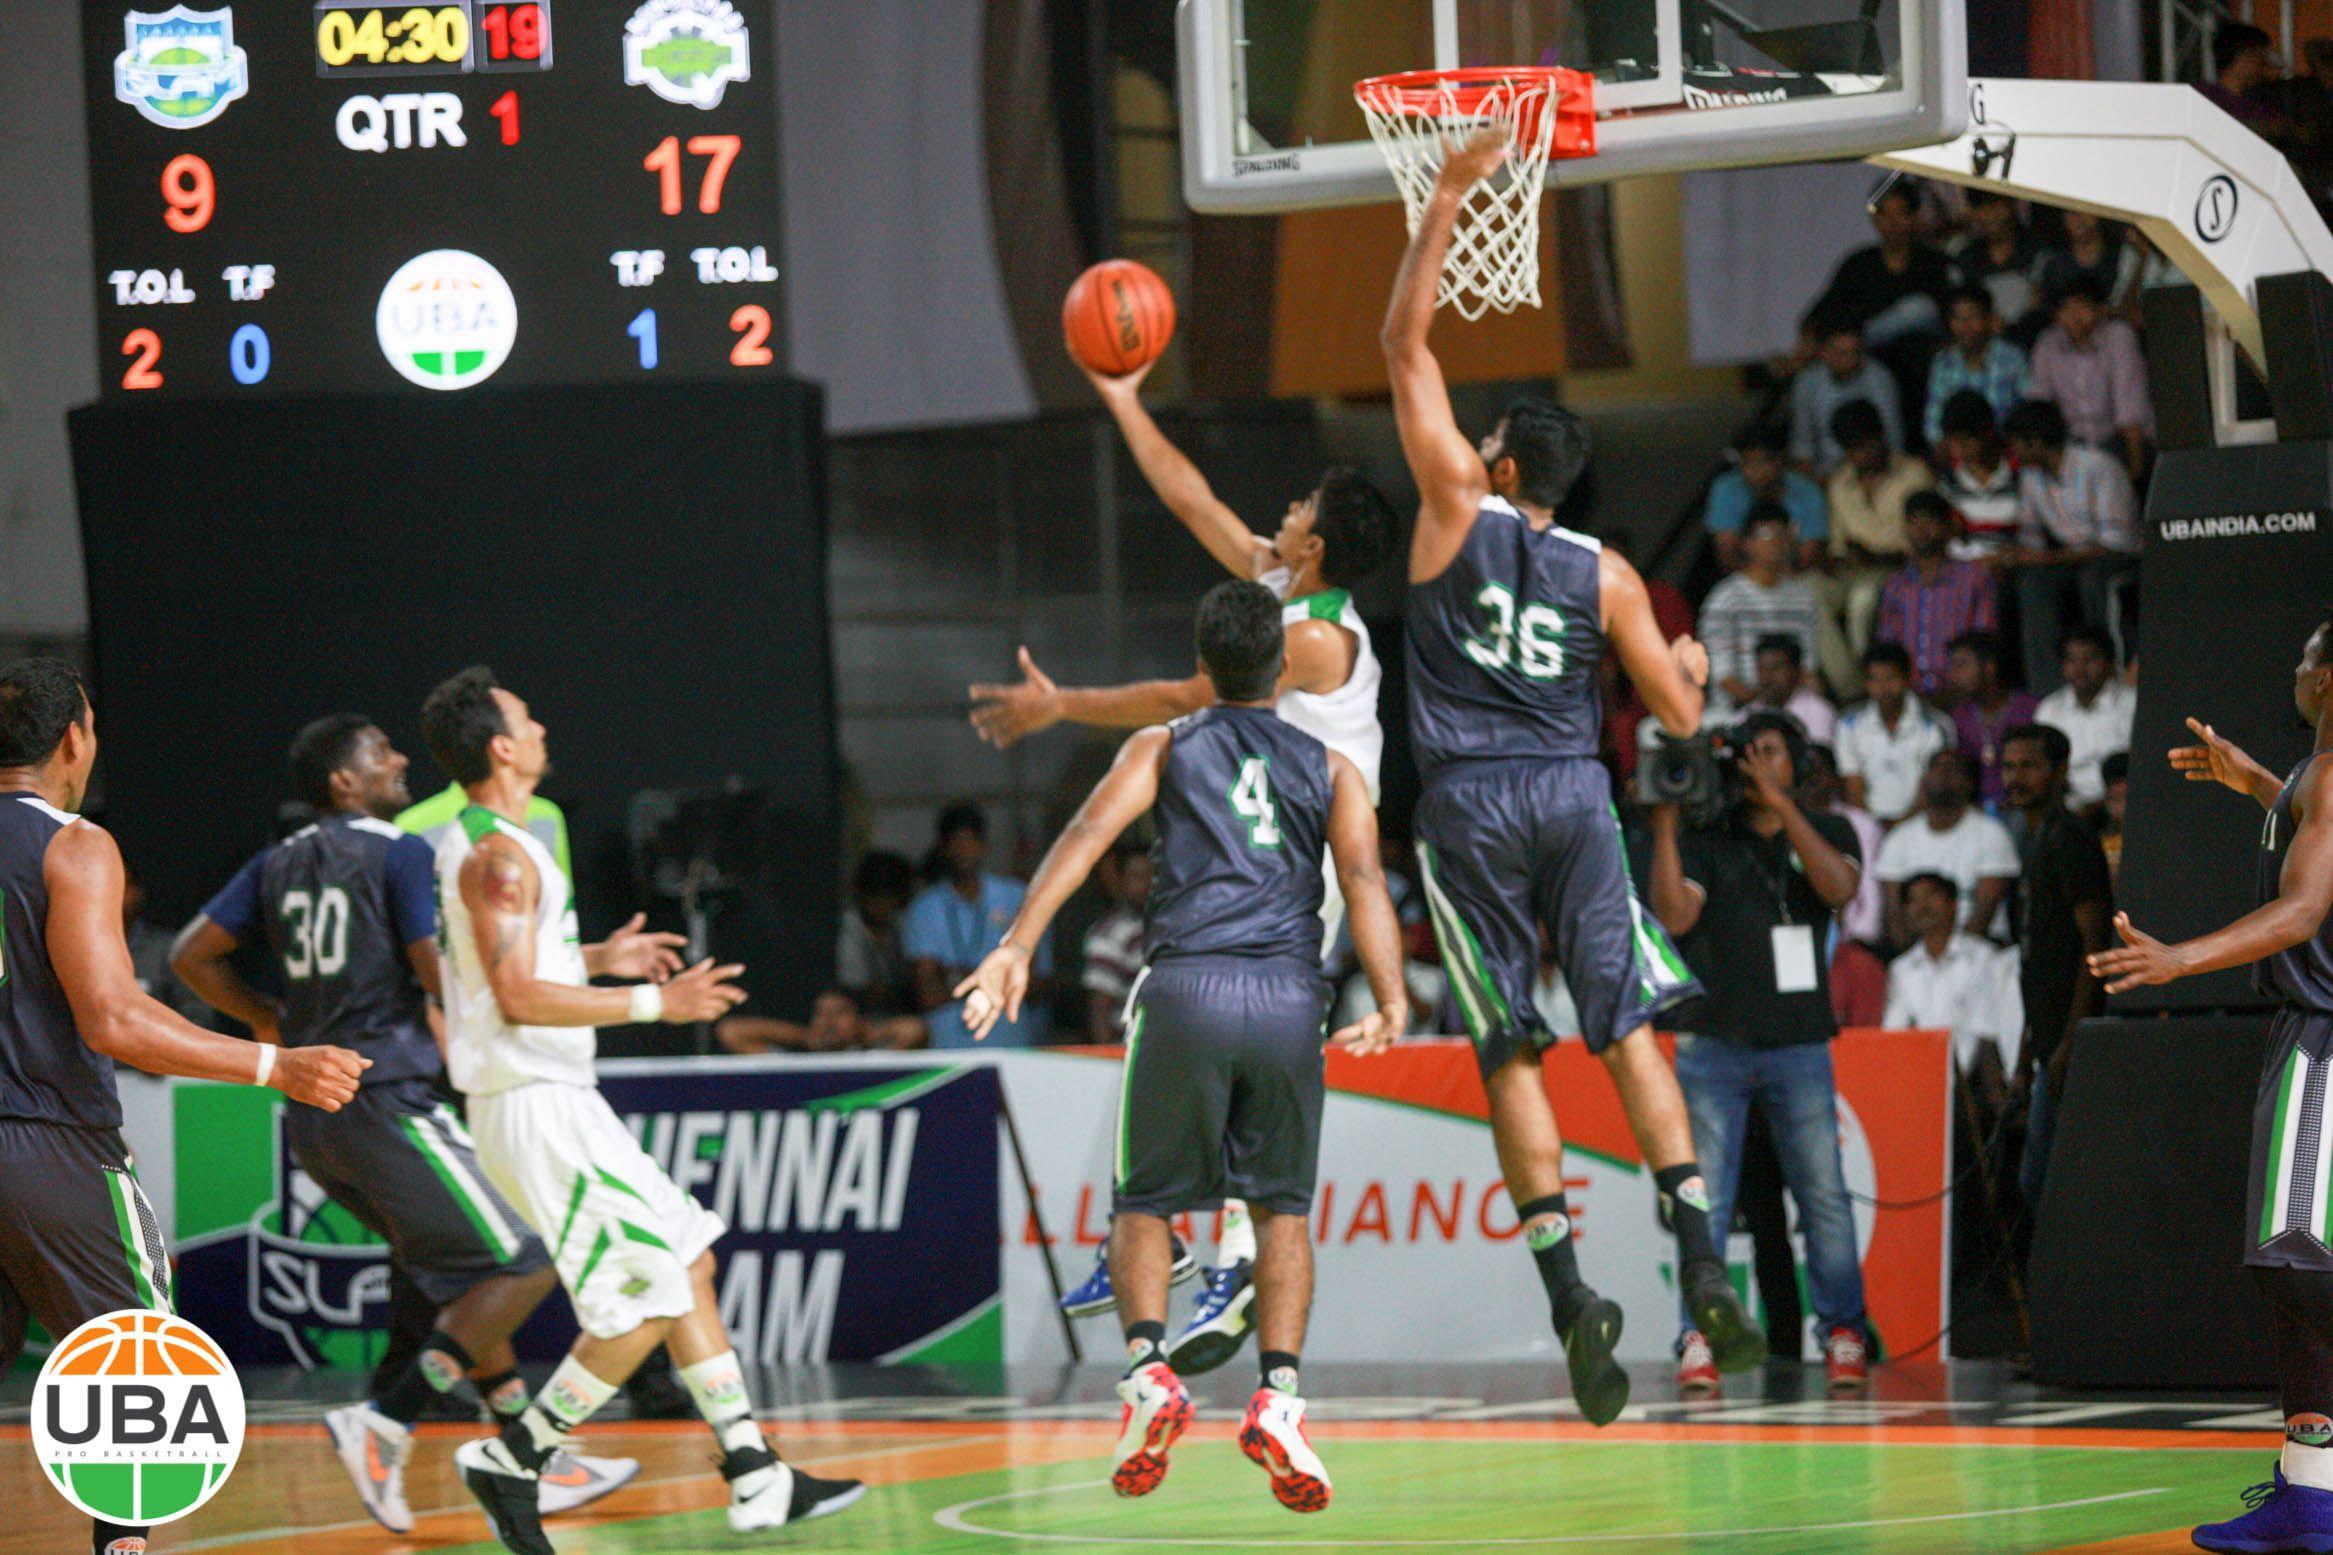 Paint Protector Rikin About To Swat One Into The Stands Vs Bengaluru Beast Ubaseason4 Ubaindia Basketball Teams Basketball Court Uba